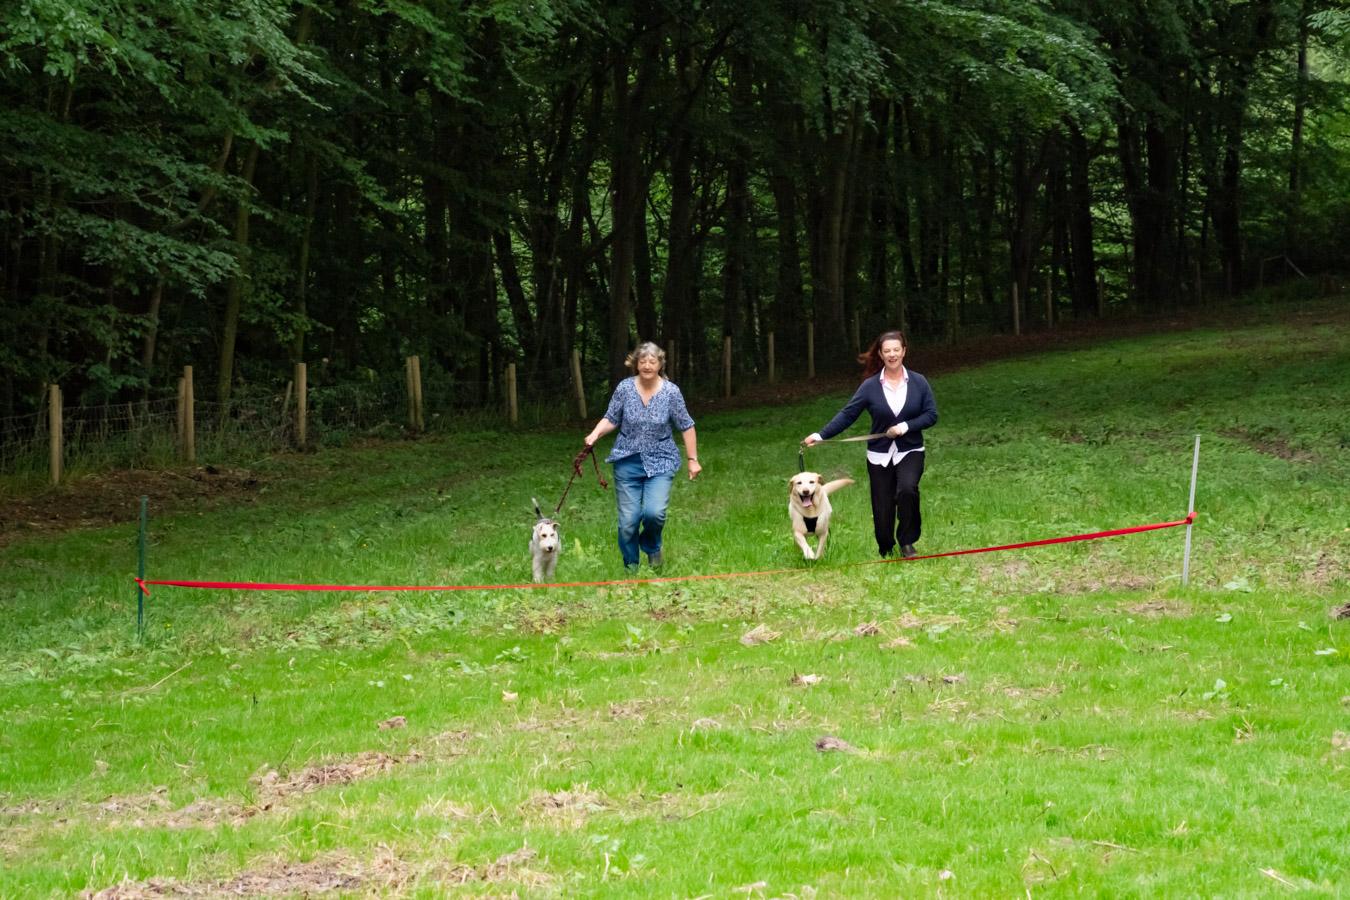 Monkton-Wyld-Best-Camping-Caravanning-West-Dorset-Dog-Friendly-Walk-5